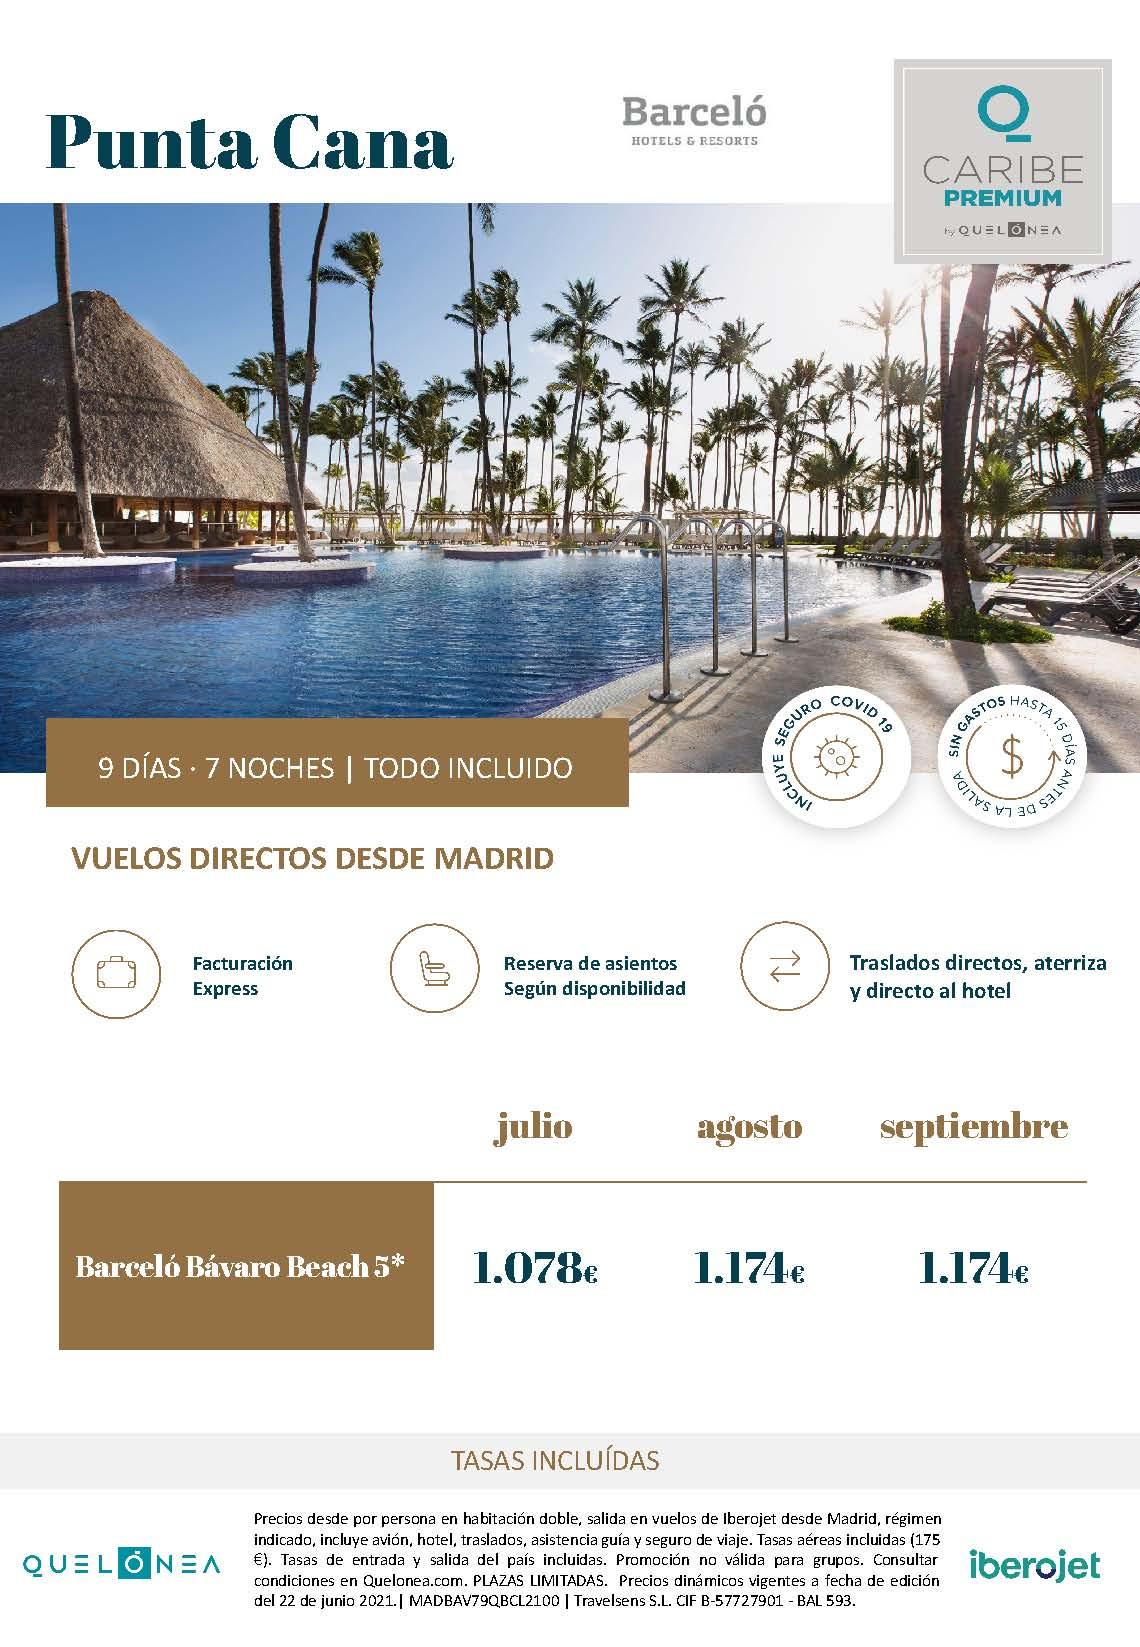 Ofertas Quelonea Caribe Premium Verano 2021 Punta Cana hoteles Barcelo vuelo directo desde Madrid